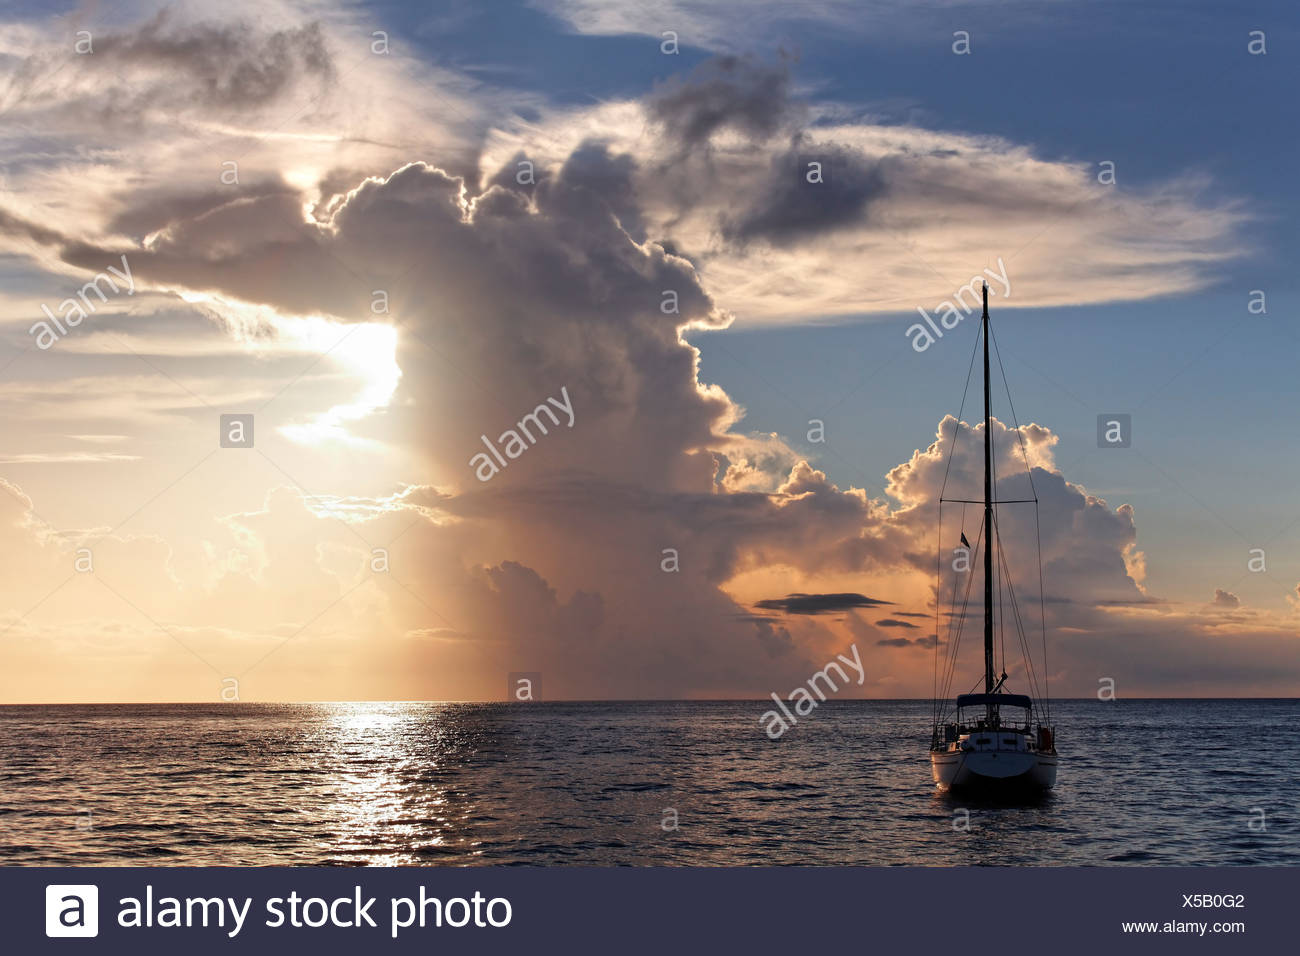 Sailboat at anchor, large storm cloud, sunset, horizon, sea, Saint Lucia, LCA, Windward Islands, Lesser Antilles, Caribbean - Stock Image